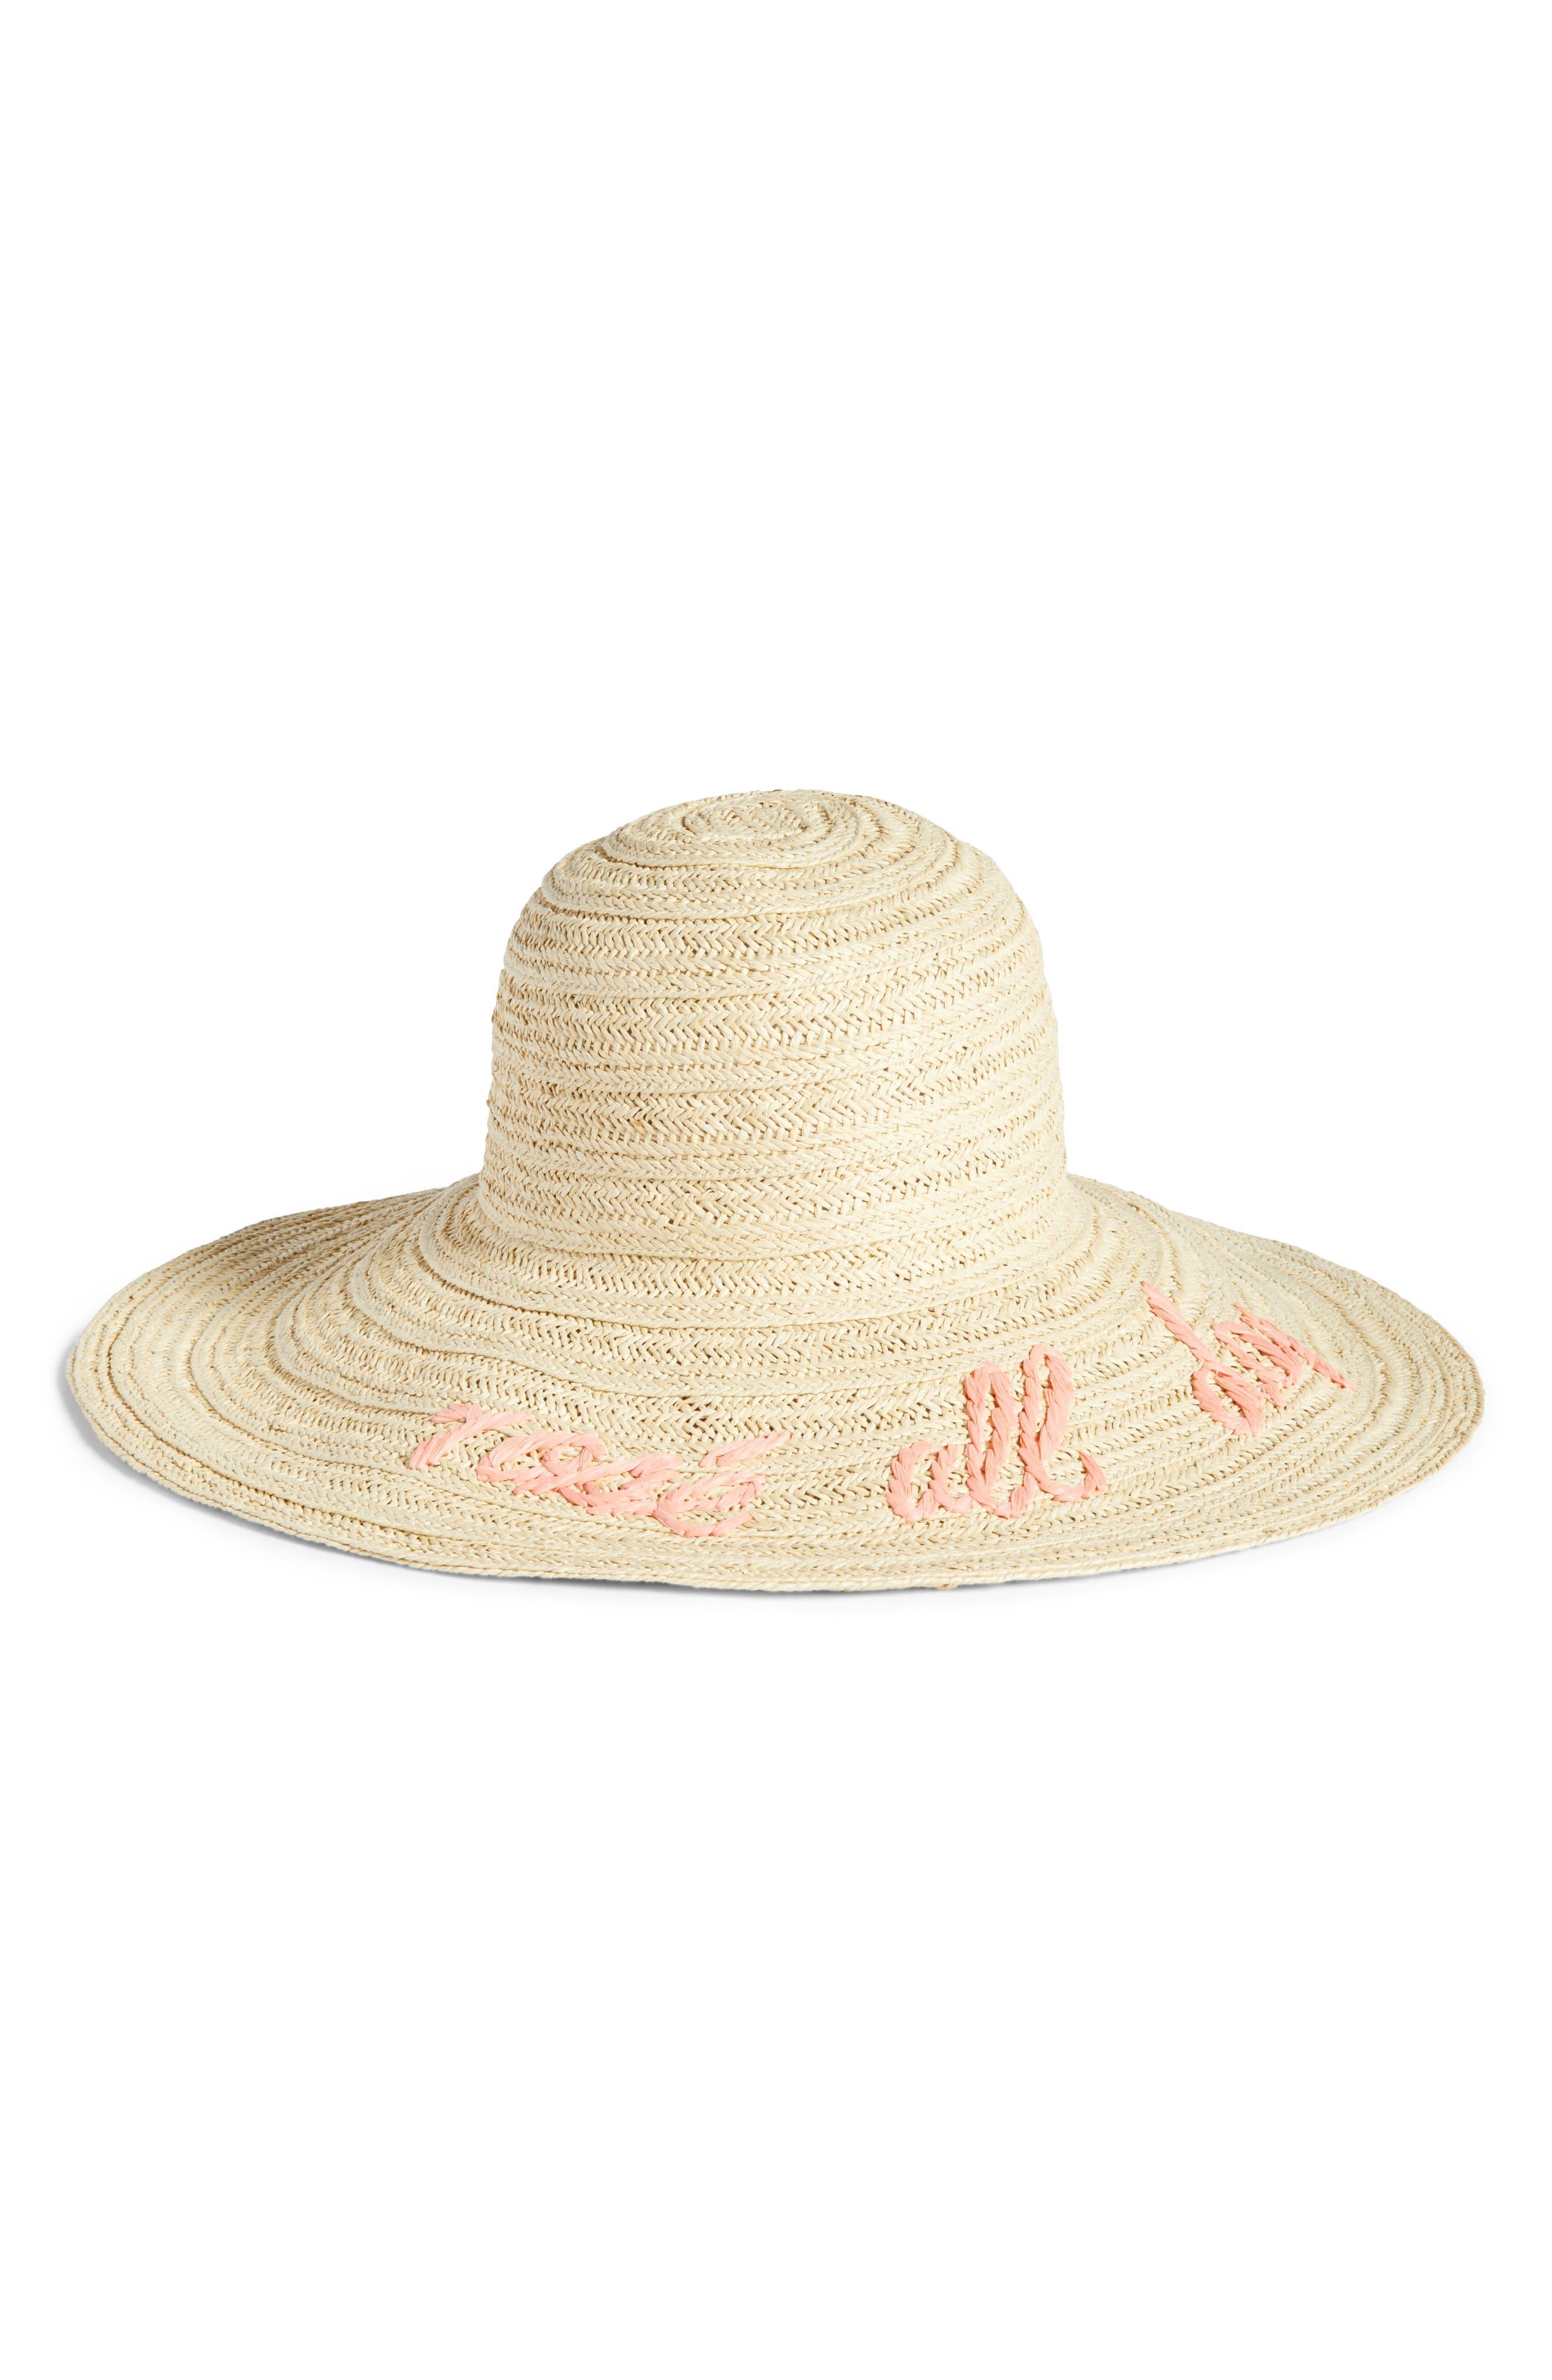 Wordplay Floppy Straw Sun Hat,                             Main thumbnail 1, color,                             Pink Tropics Combo